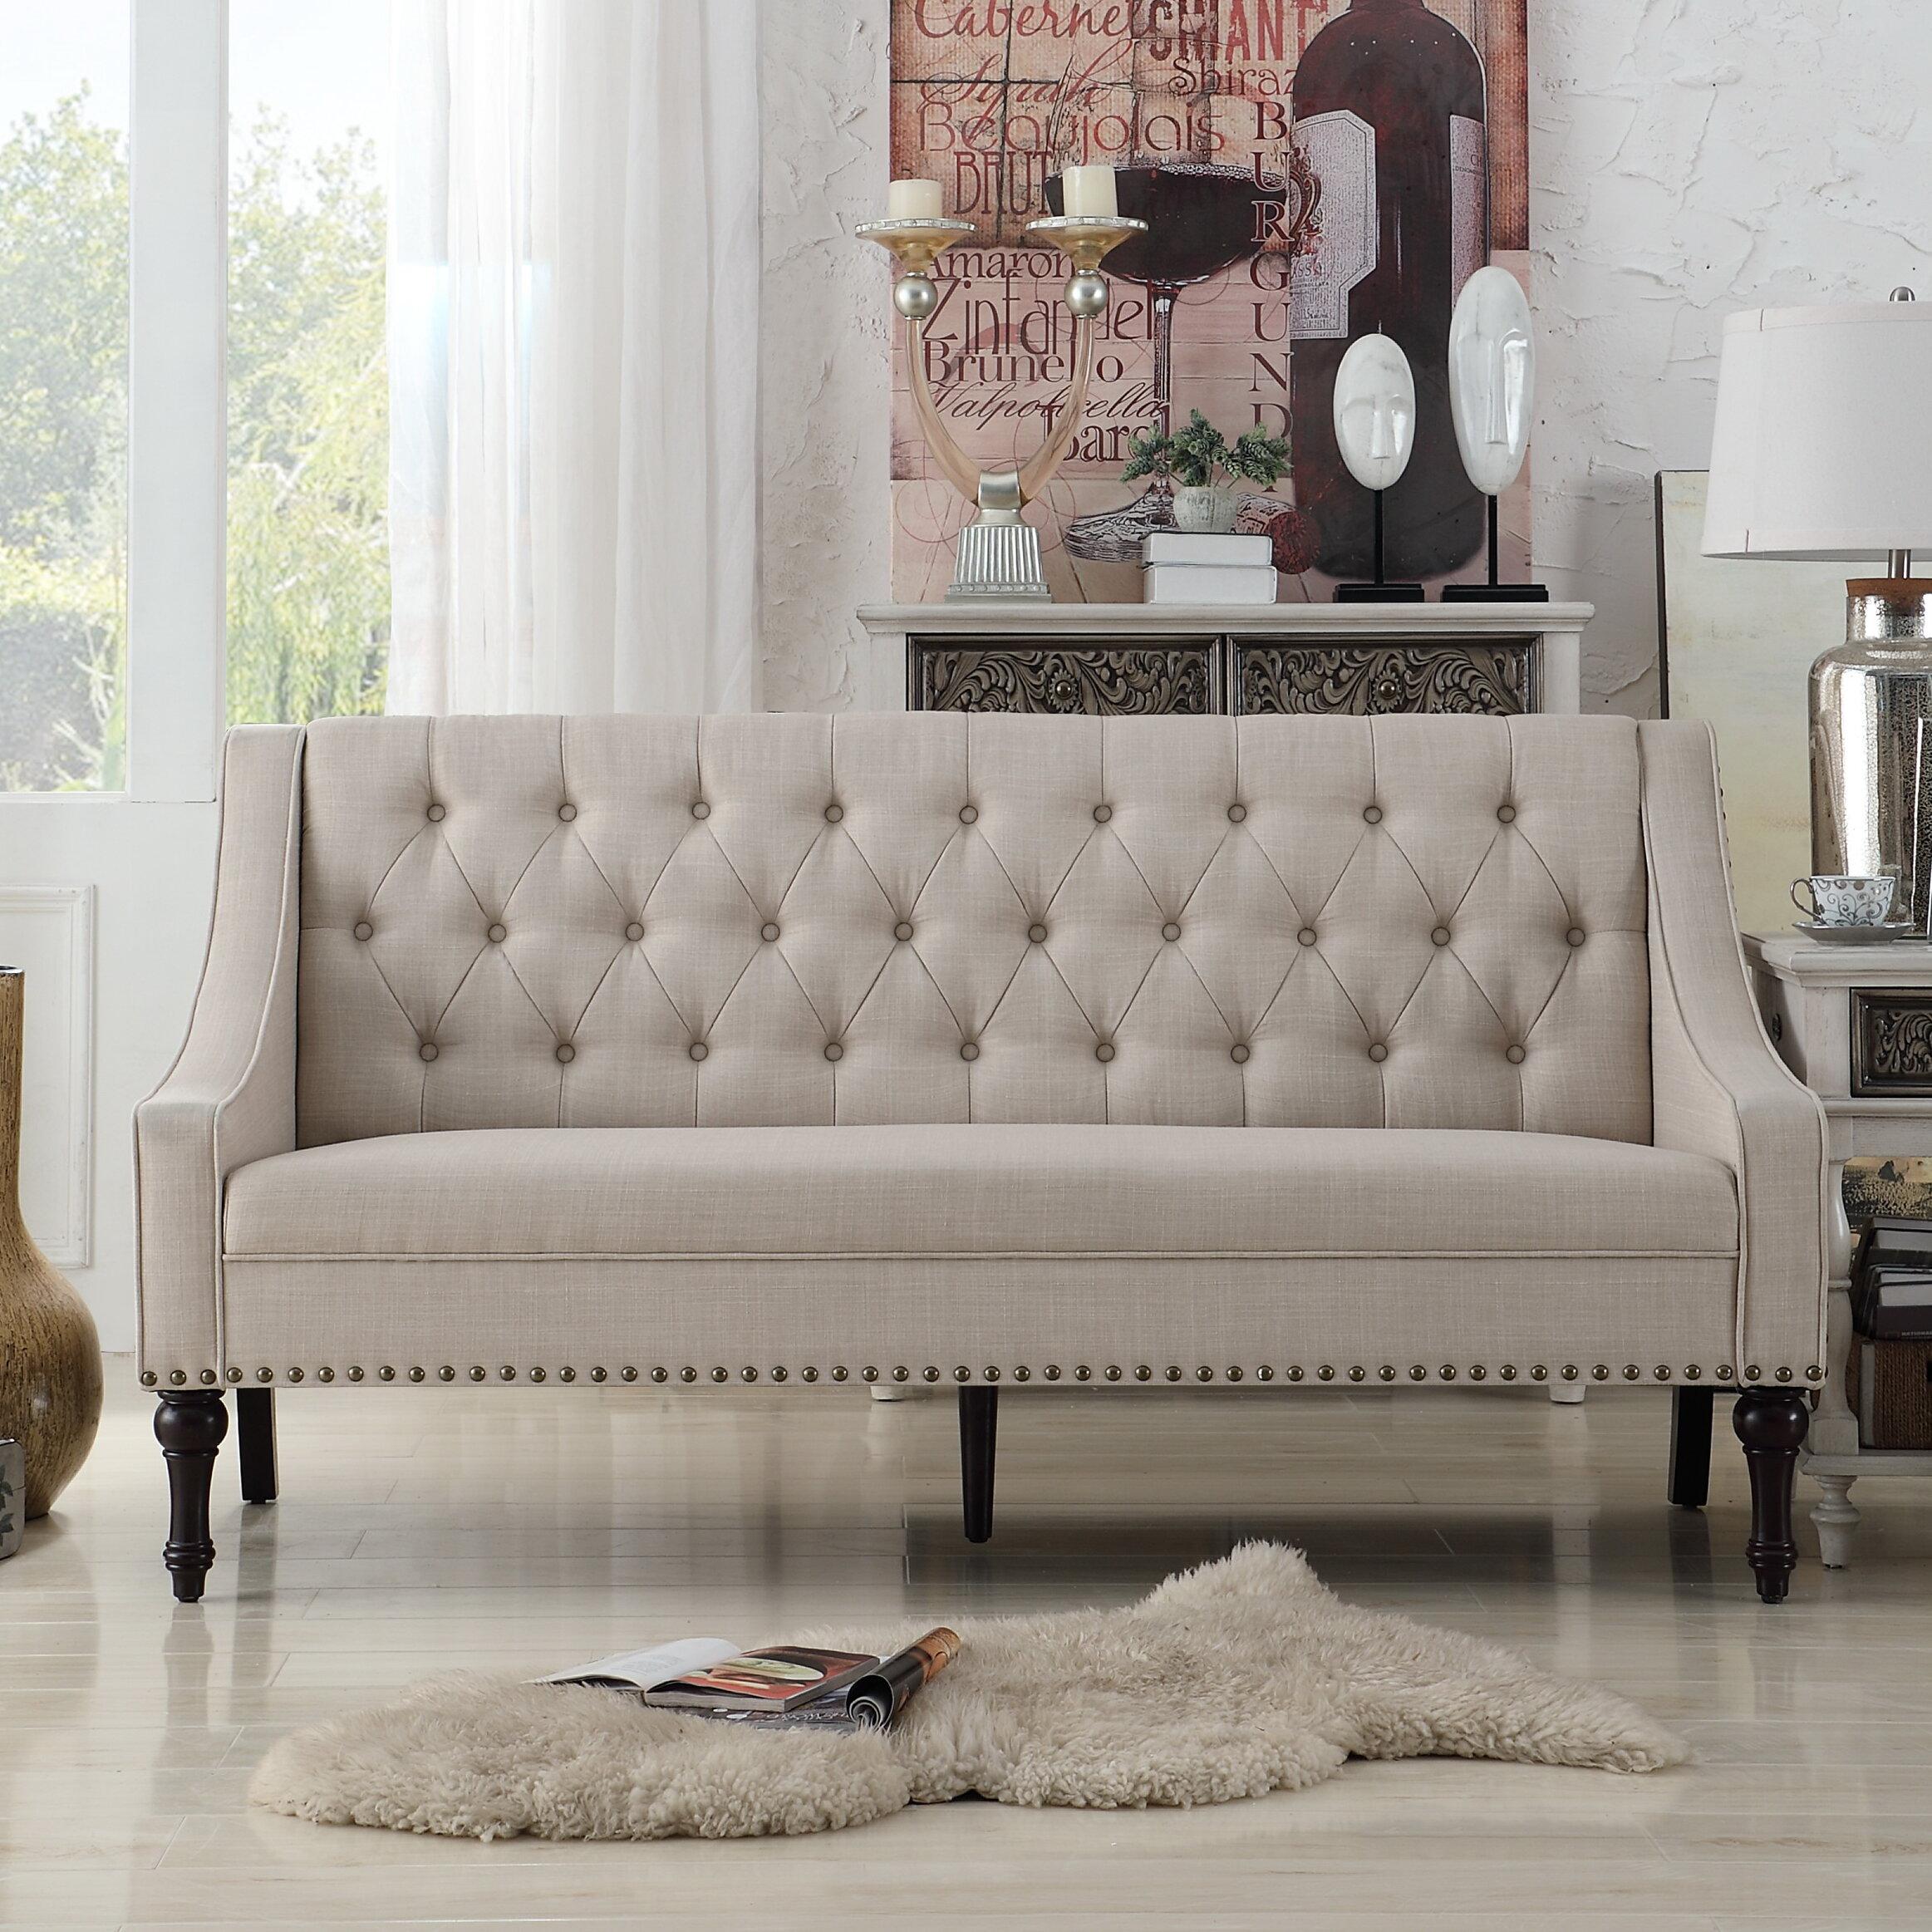 Alcott hill christiansburg tufted sofa reviews wayfair ca